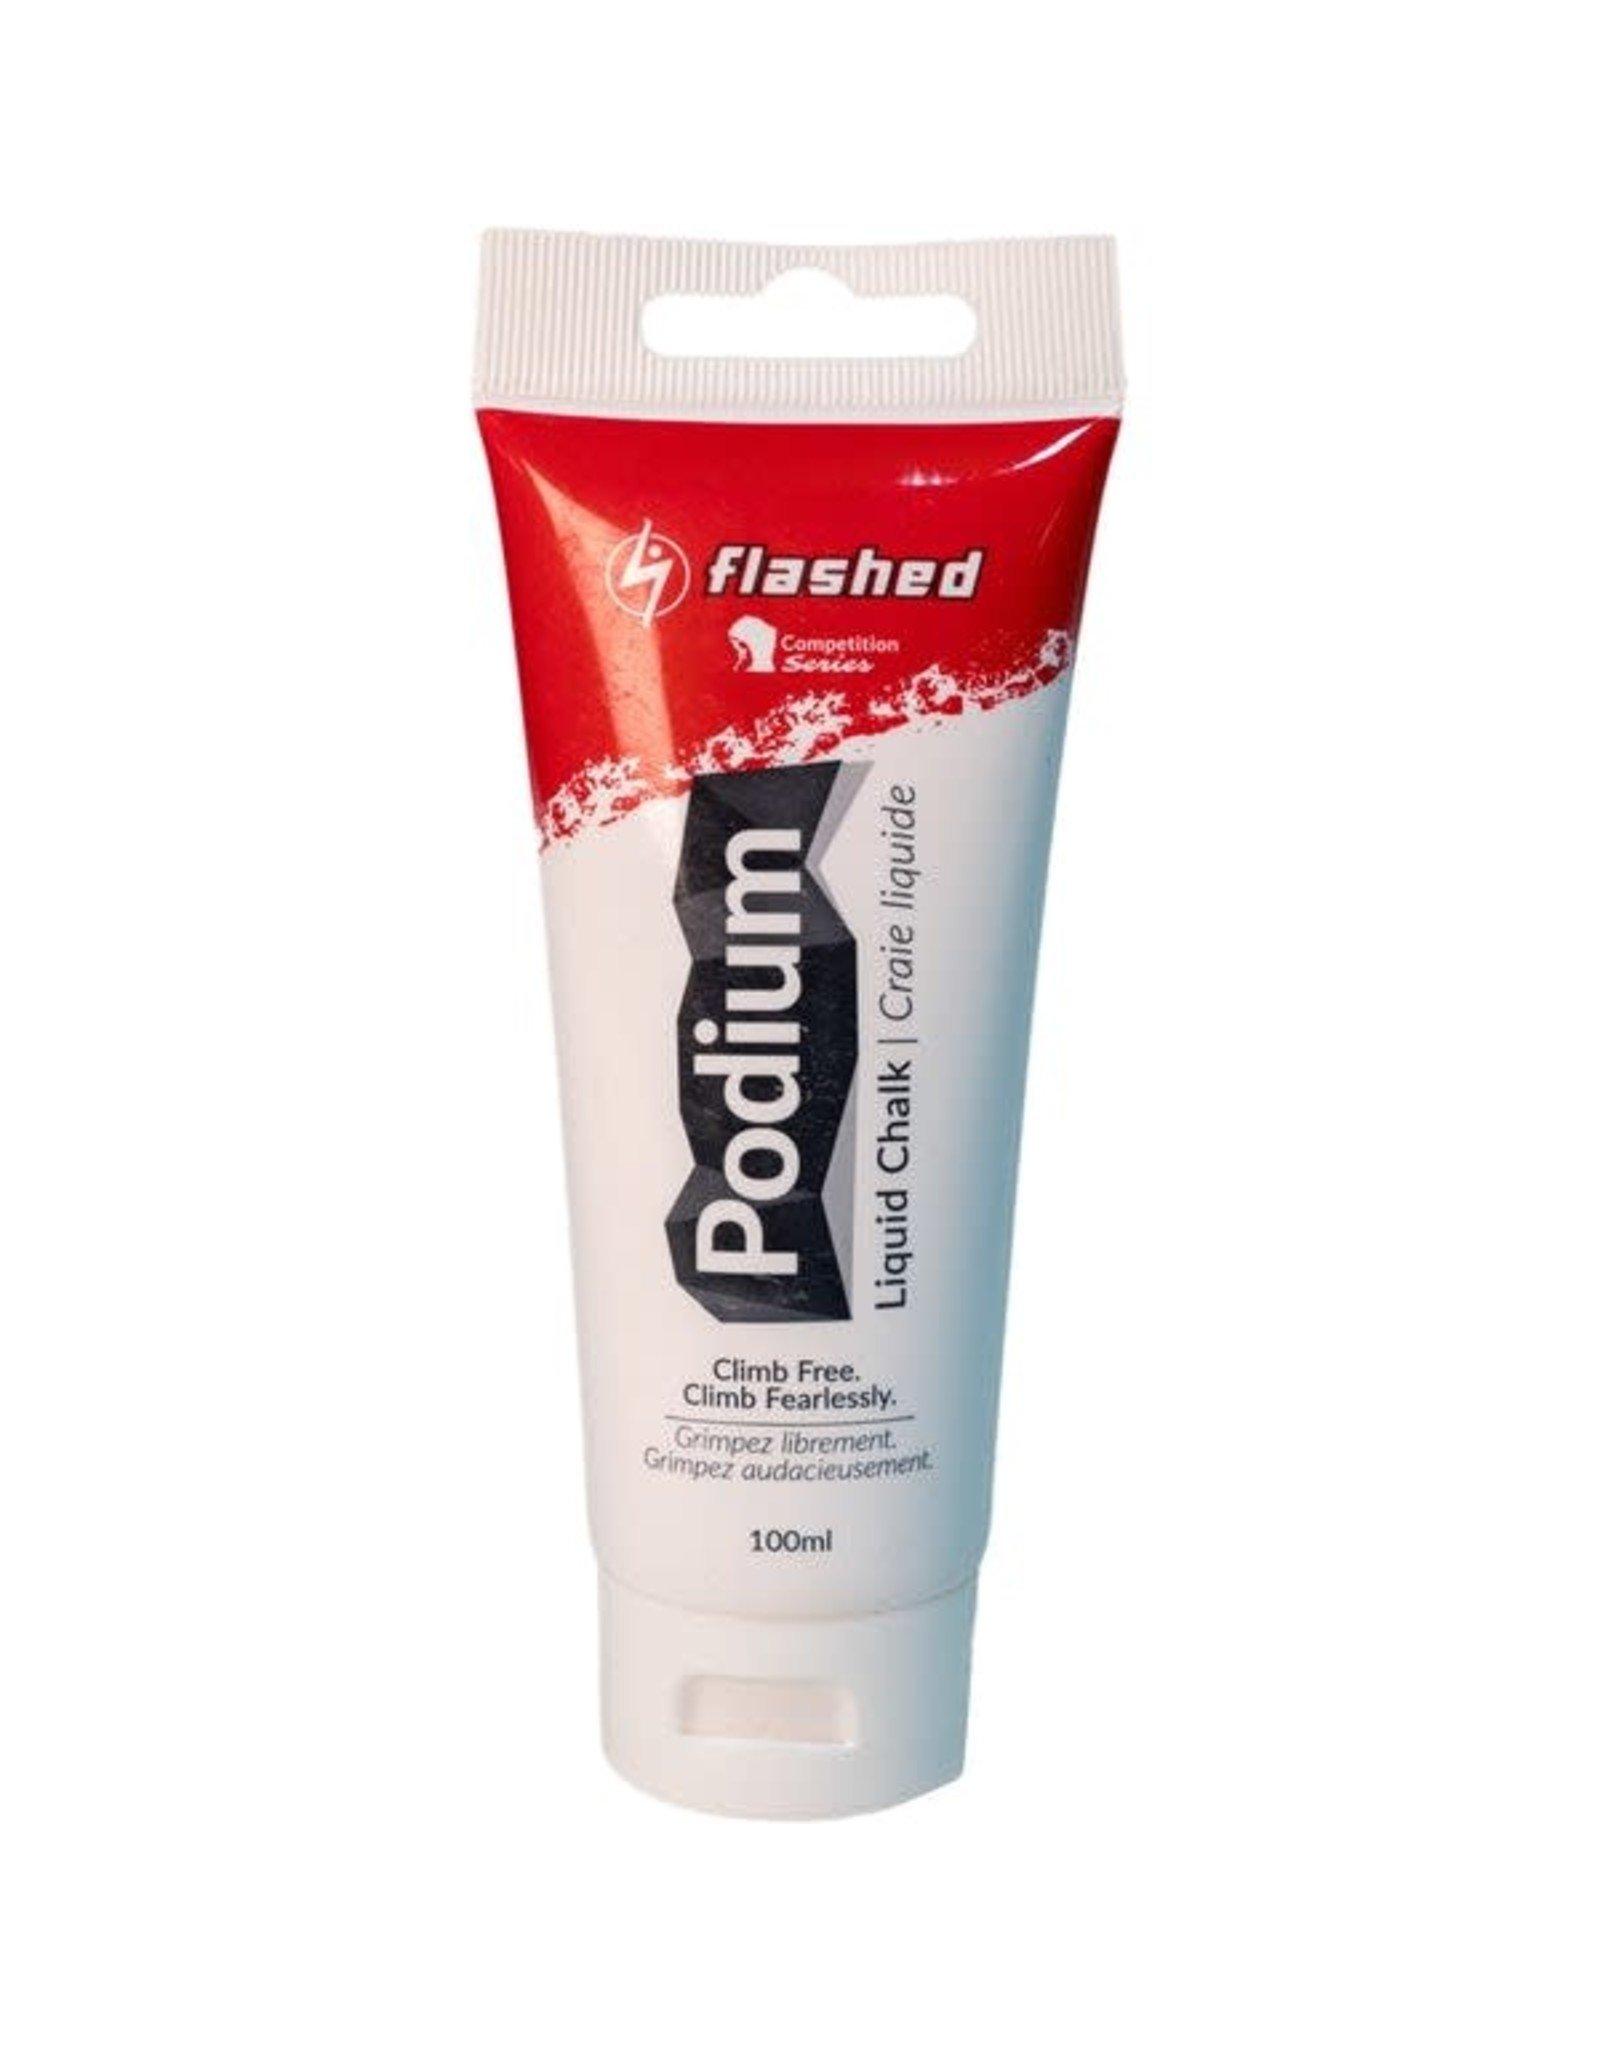 Flashed Podium Liquid Chalk